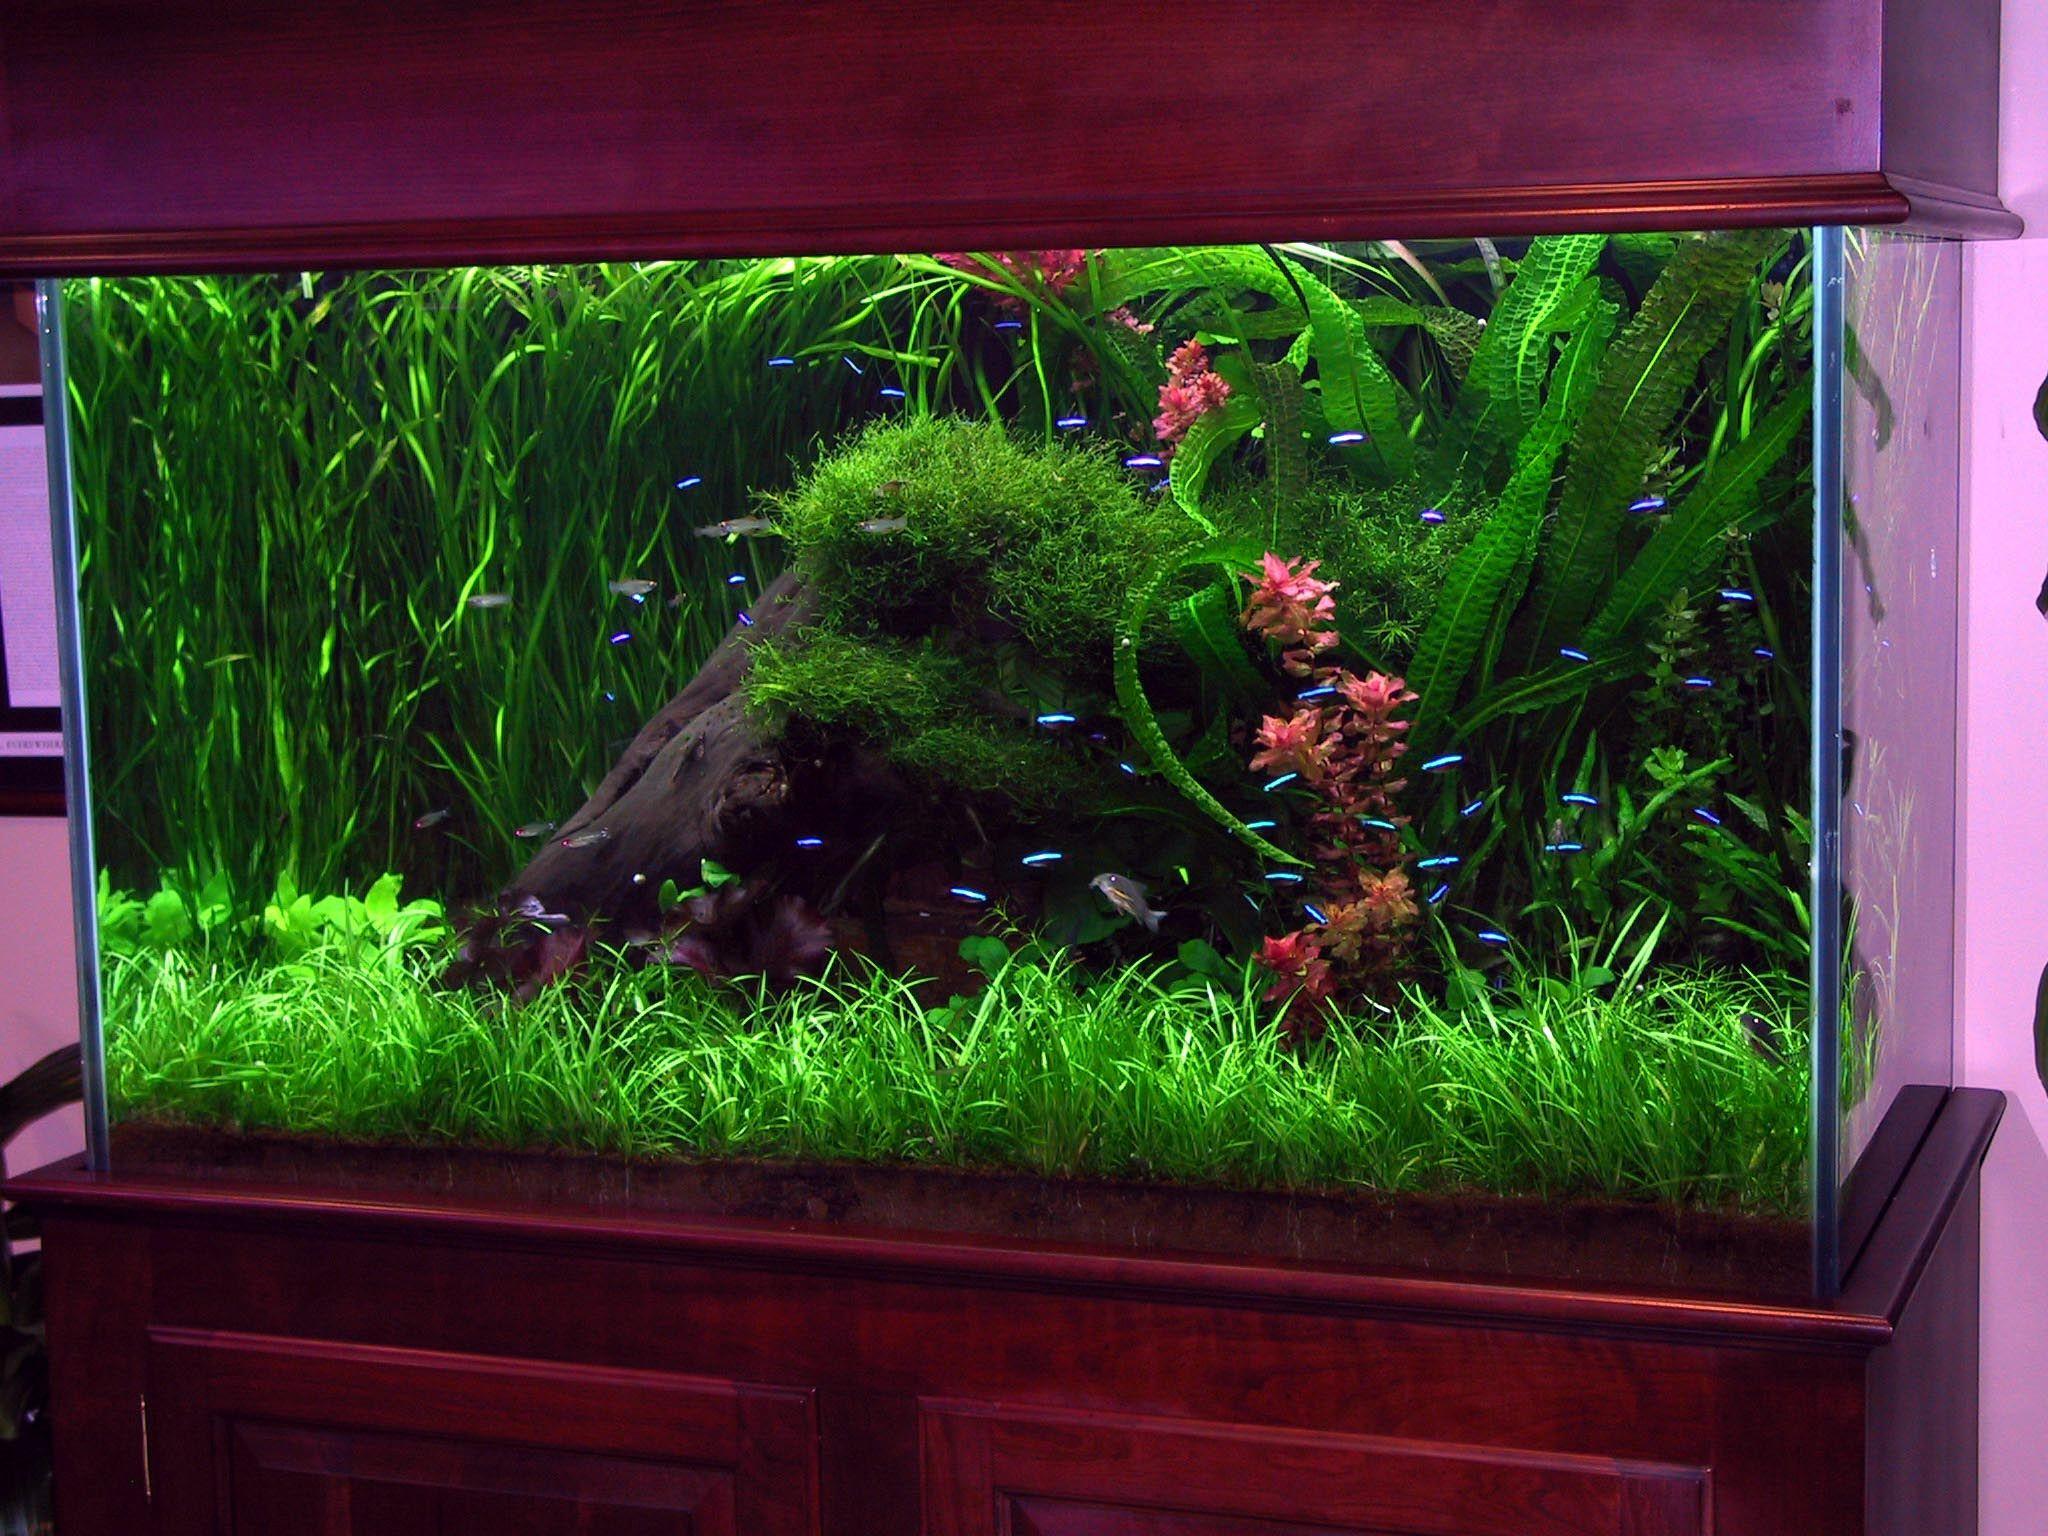 Interior designs ideas corner fish tanks aquariums acrylic tank design filter gravel custom large start background